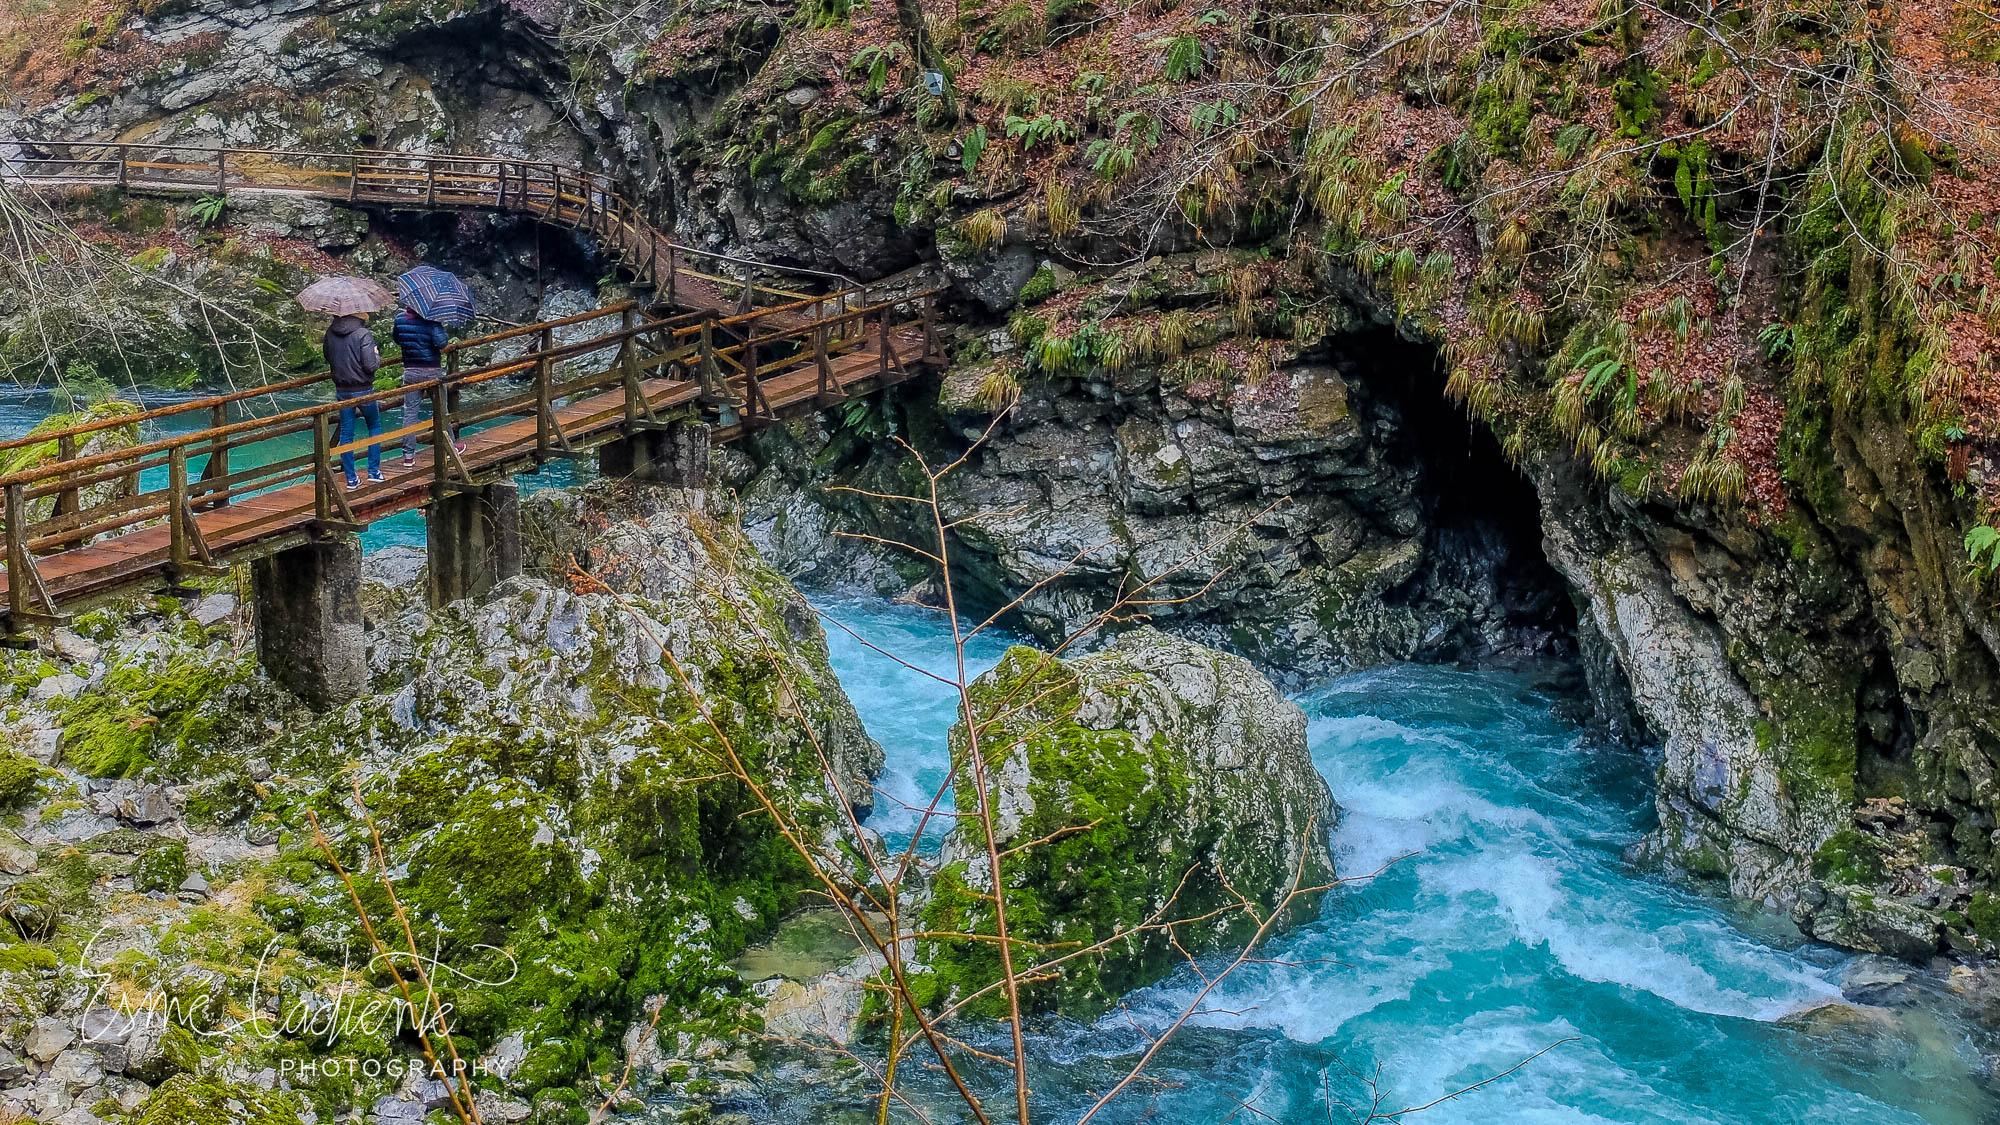 Blejski Vintgar, a natural gorge born from the turquoise river Radovna.